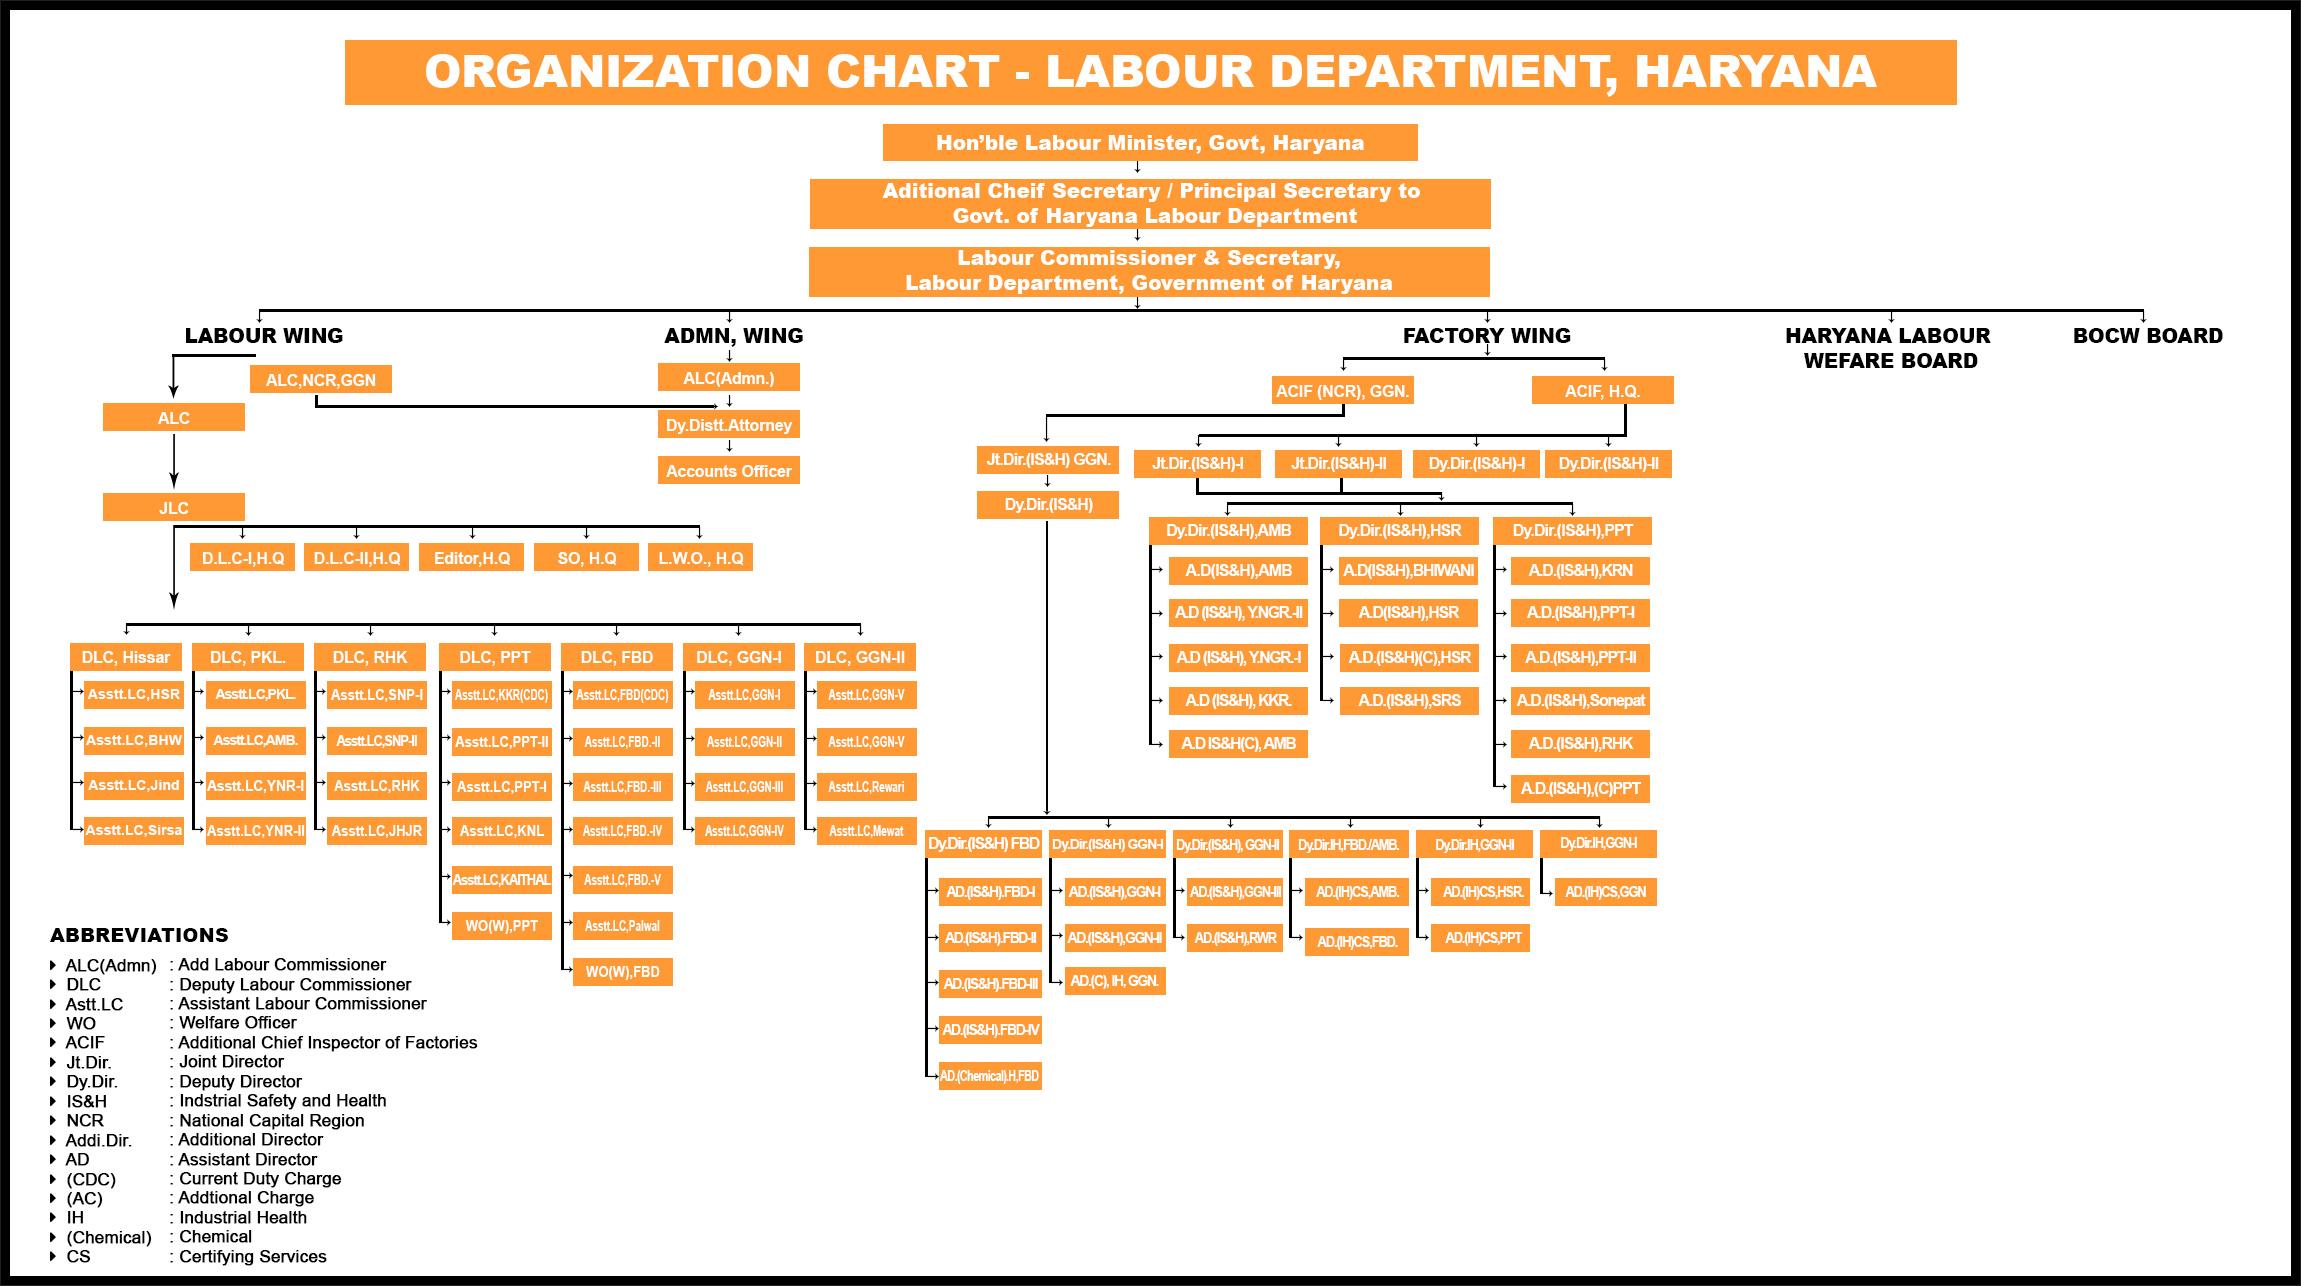 Labour Department Haryana Organization Structure